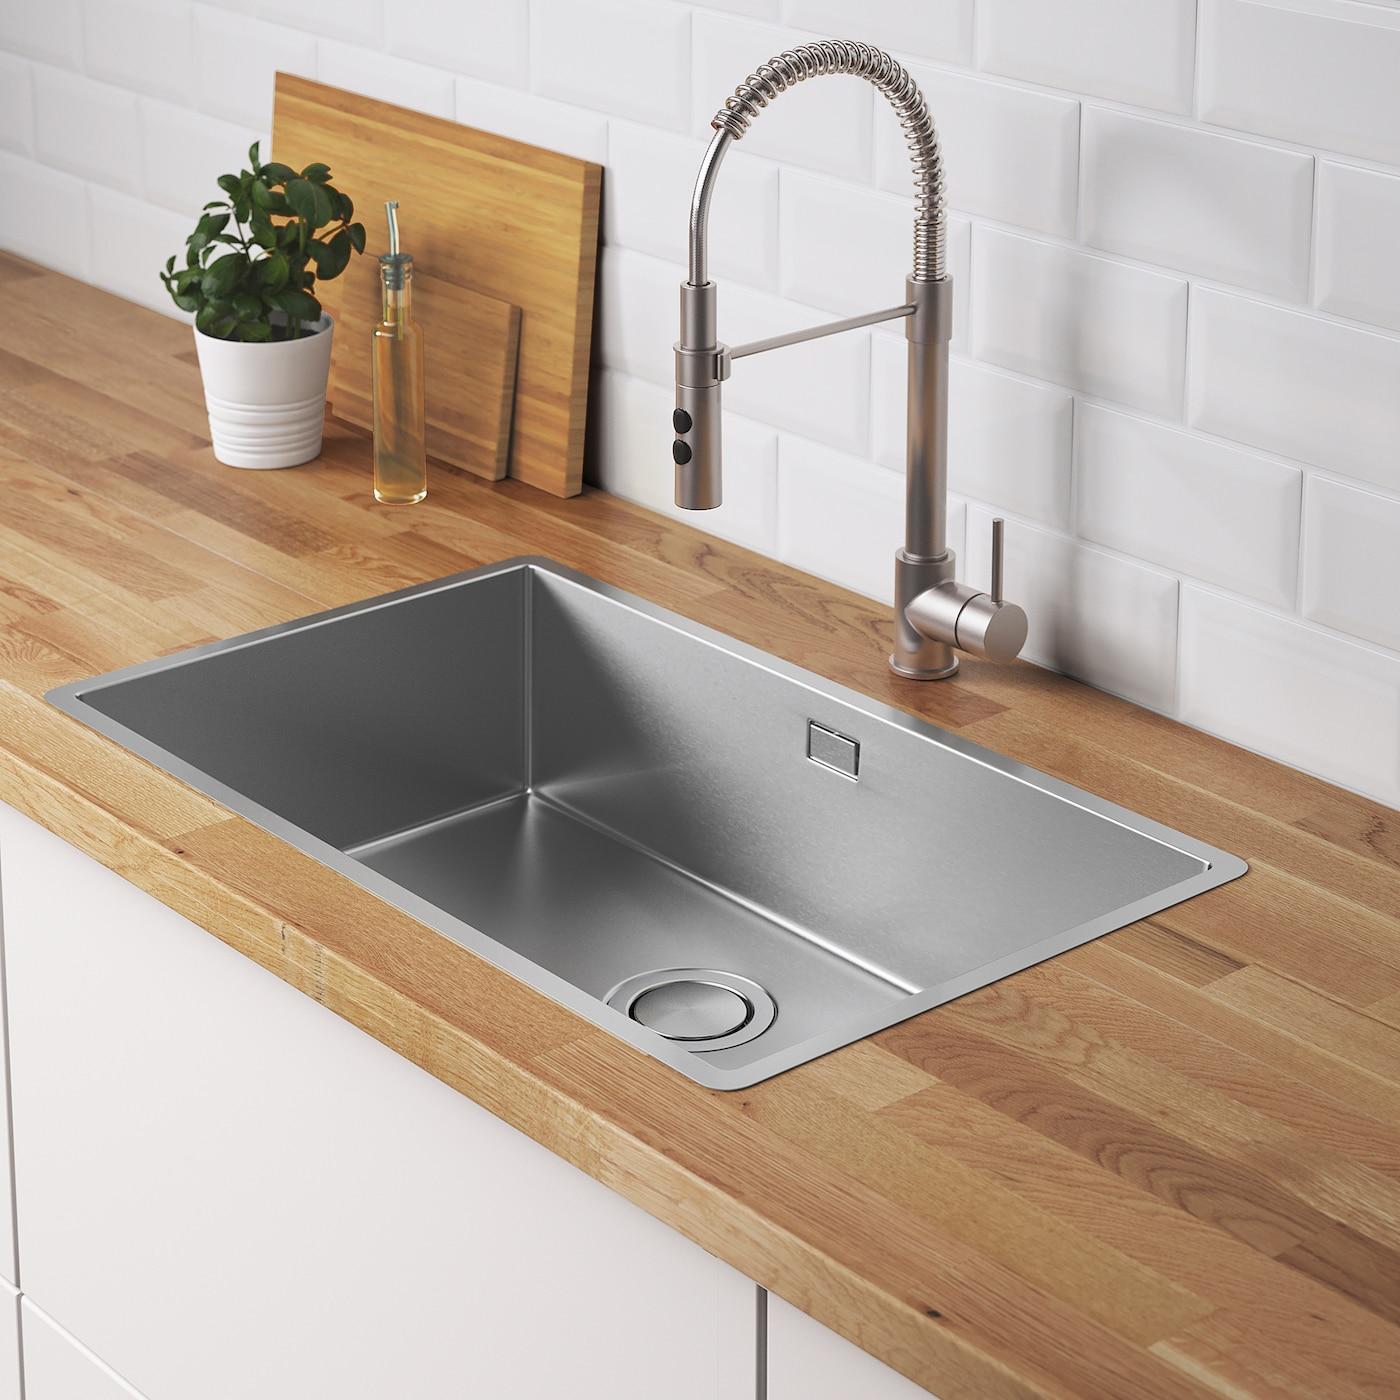 NORRSJÖN Inset sink, 4 bowl - stainless steel 4x4 cm